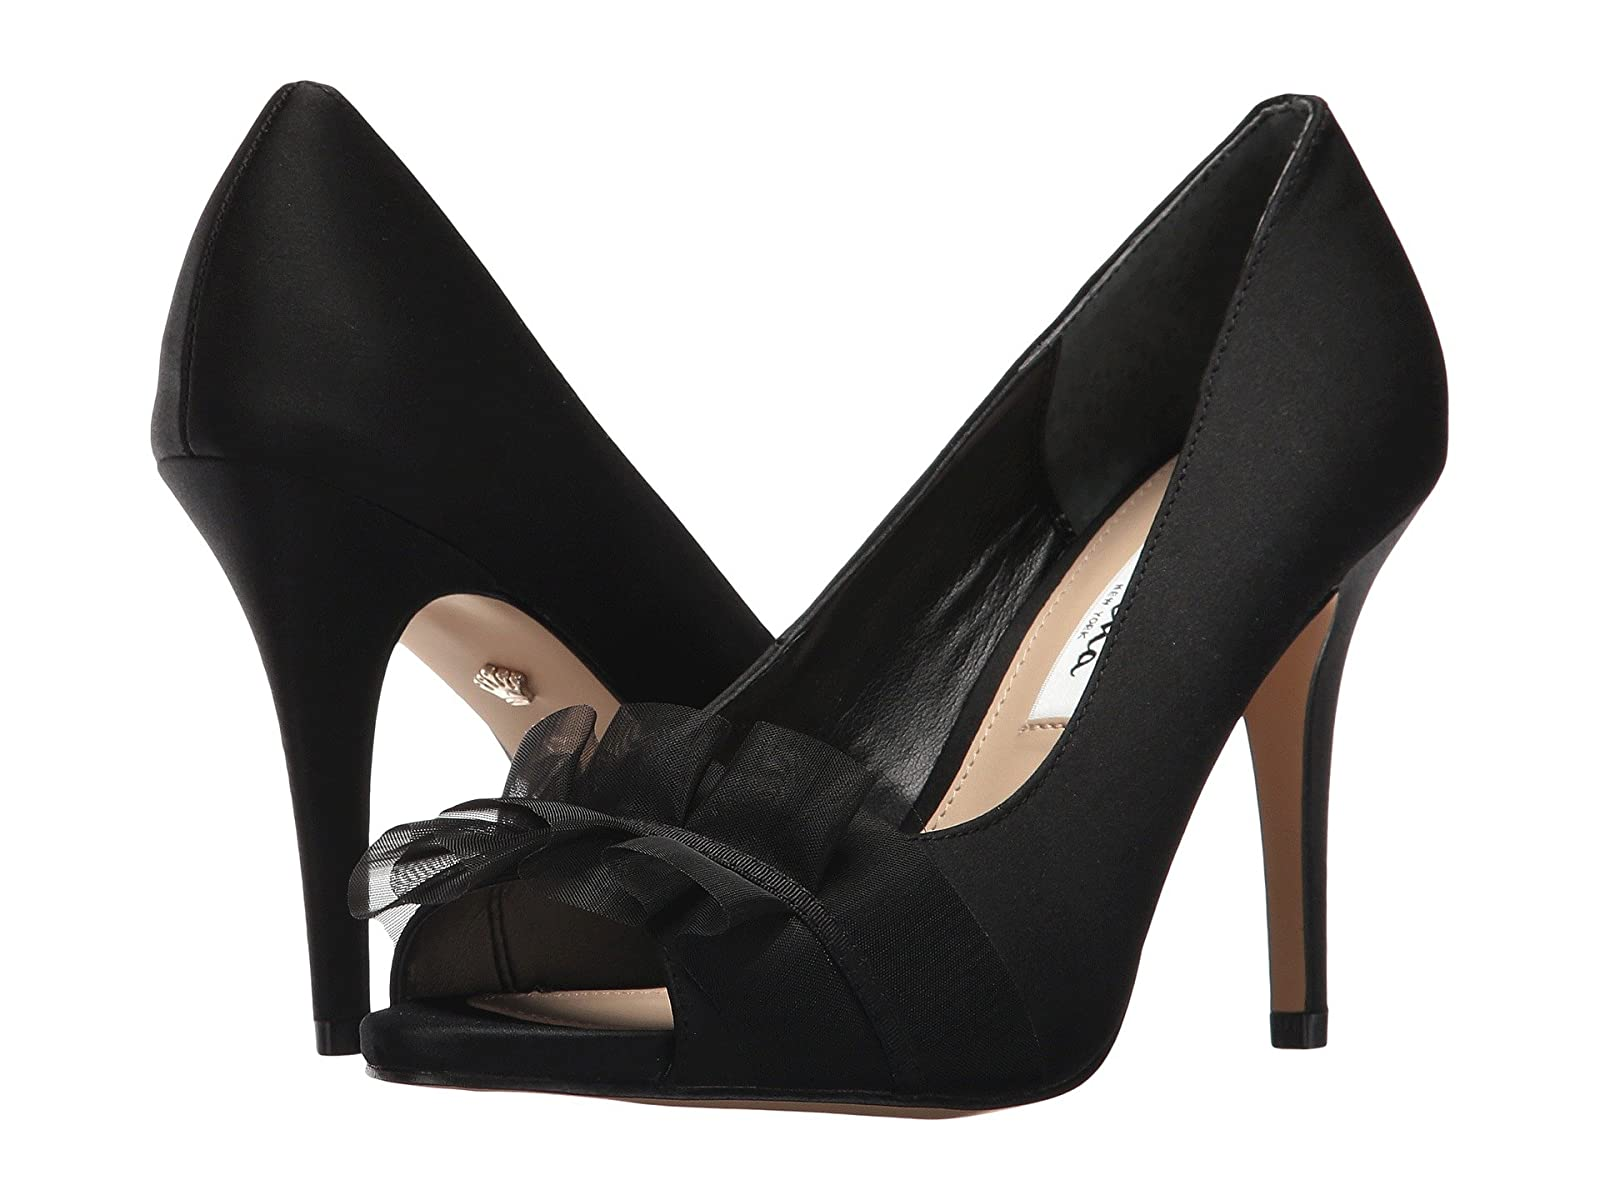 Nina RaizelCheap and distinctive eye-catching shoes